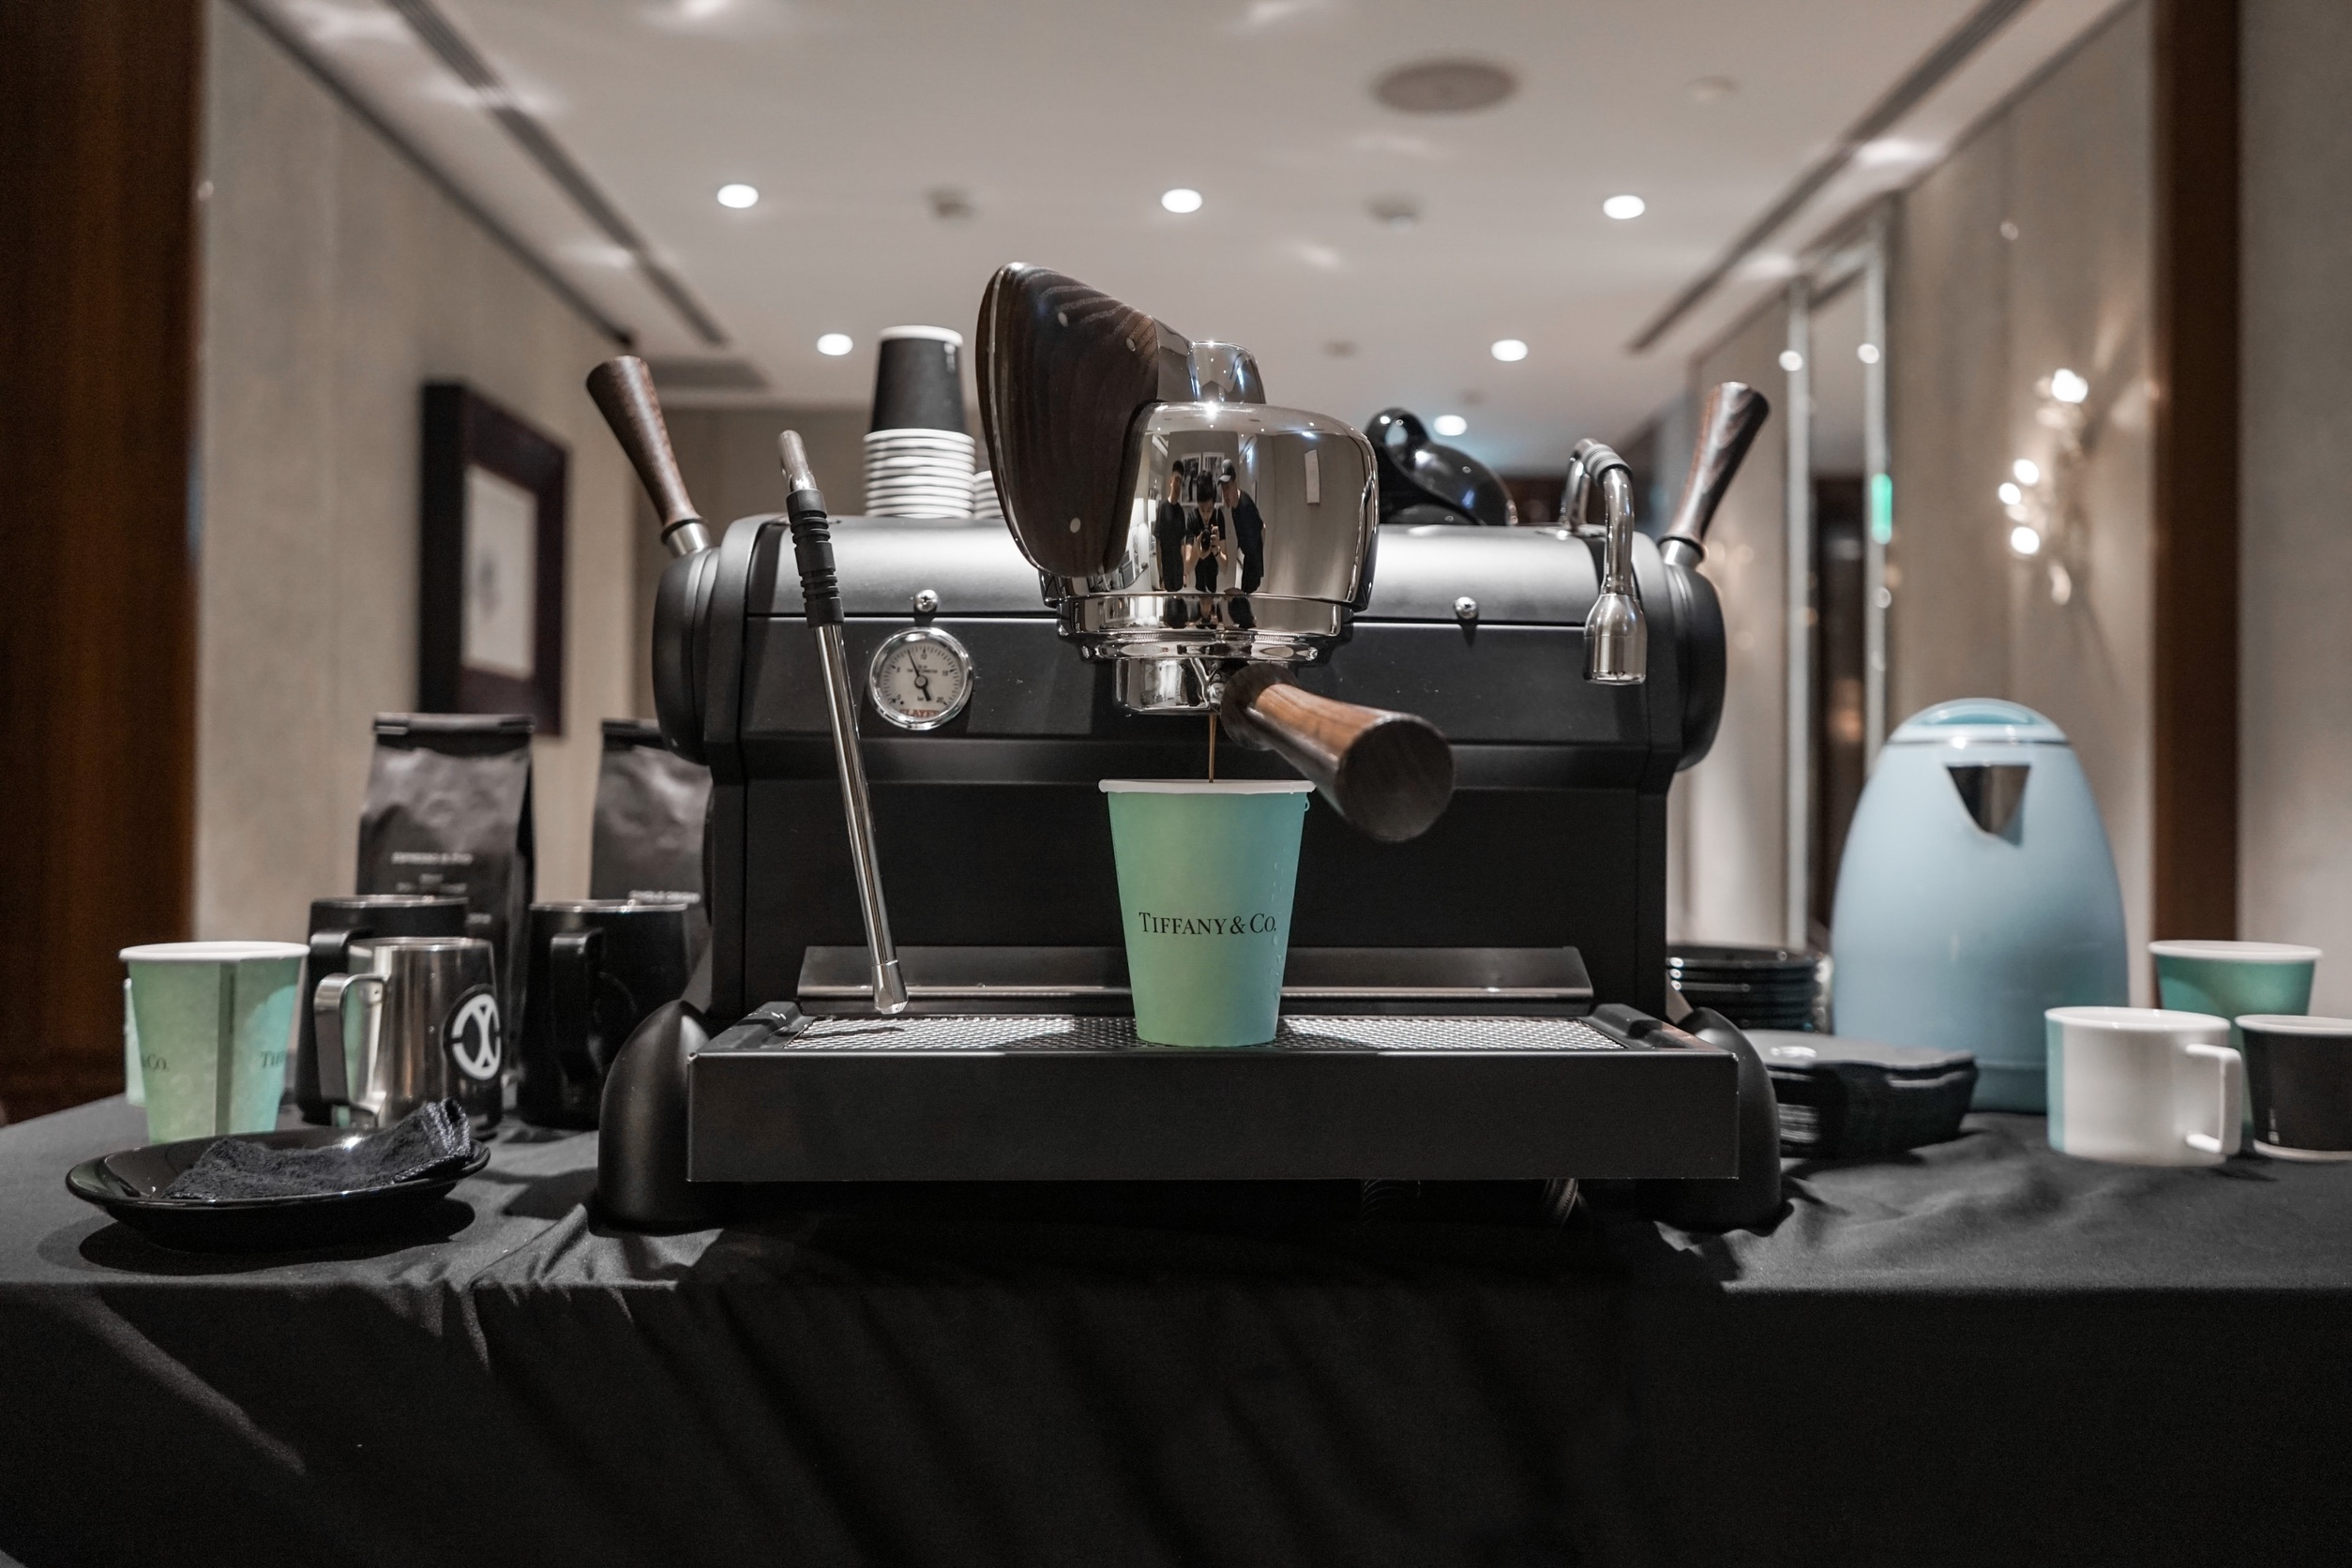 Tiffany & Co. Exclusive Coffee Workshop